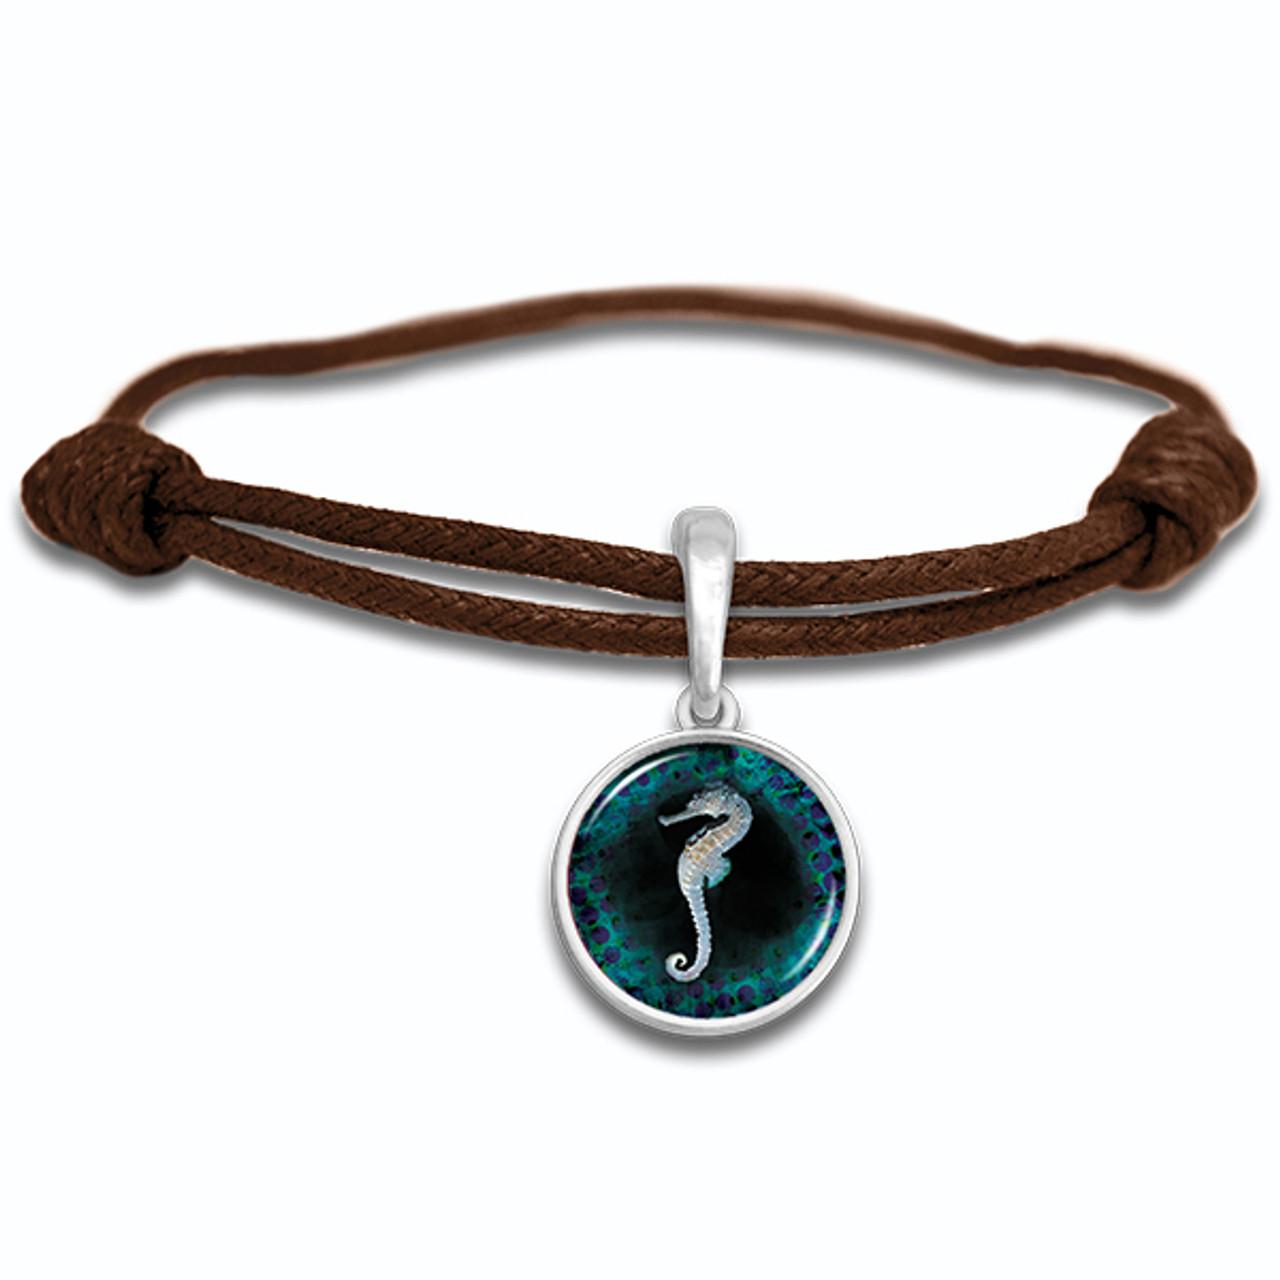 Sea Horse Adjustable Leather Bracelet